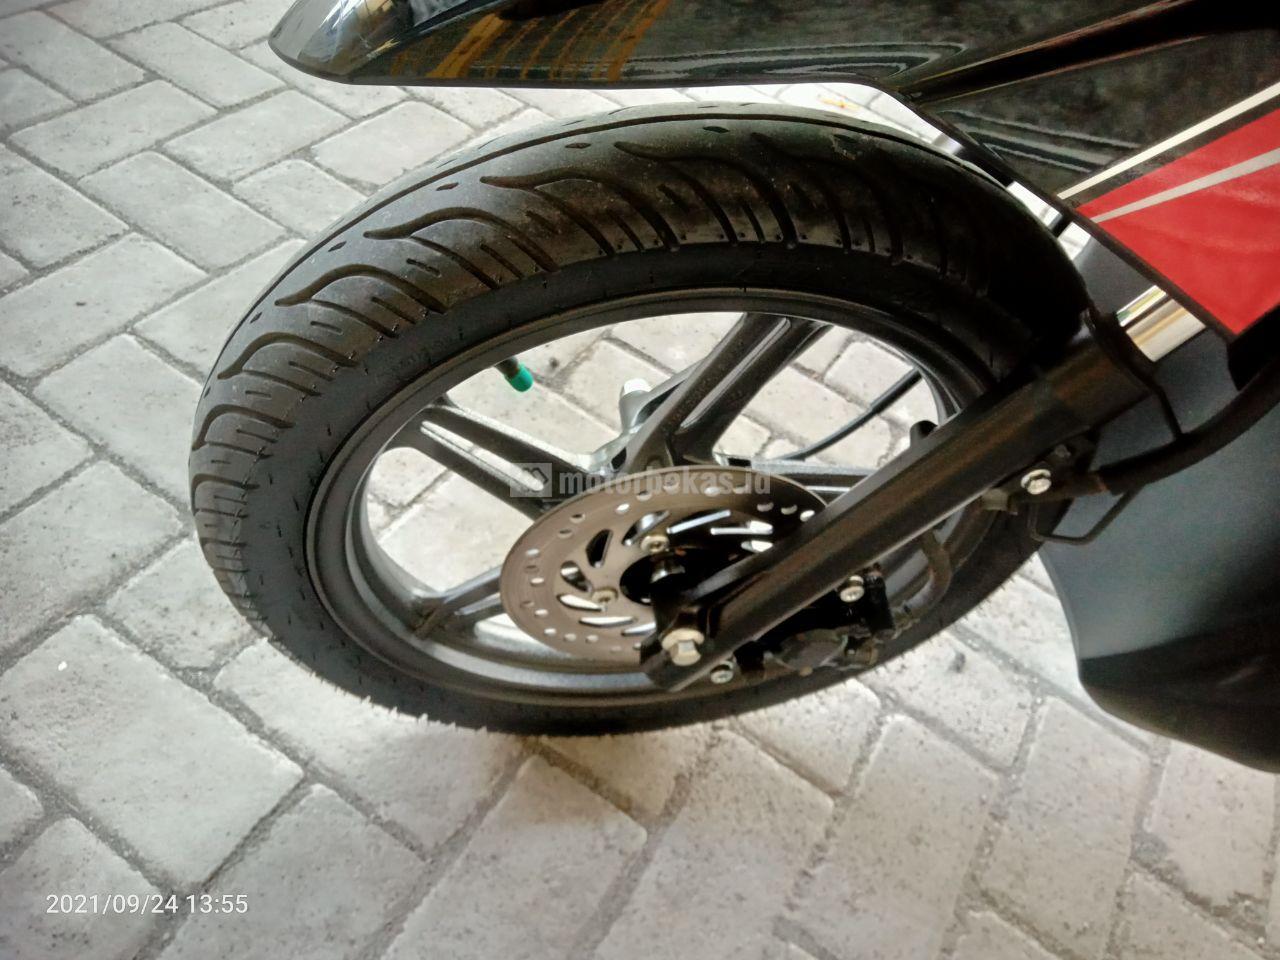 HONDA VARIO 110 FI 2019 motorbekas.id